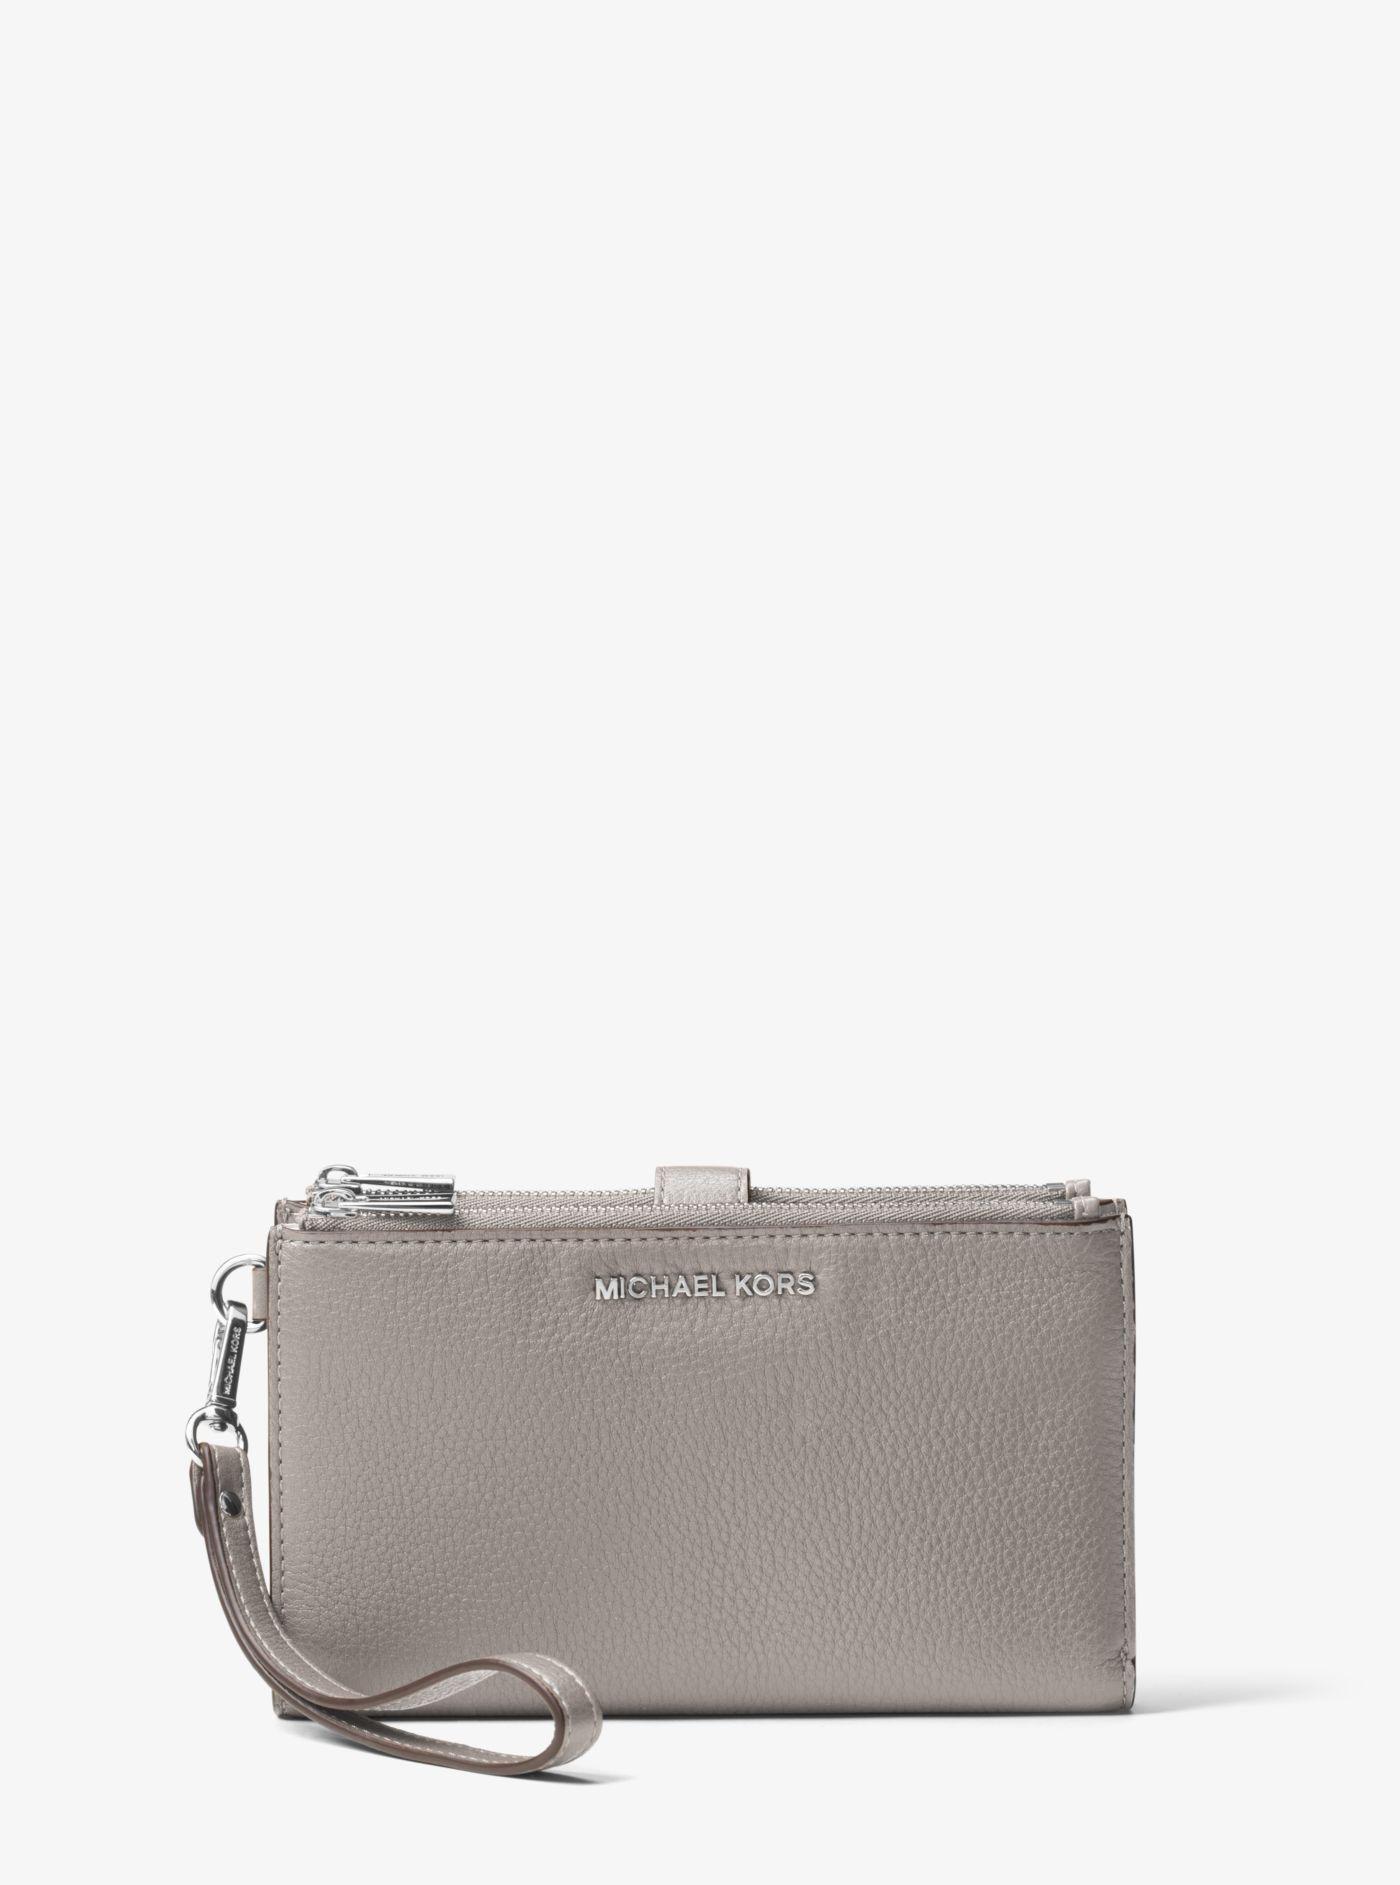 daf49375b40d Michael Kors - Gray Adele Leather Smartphone Wallet - Lyst. View fullscreen